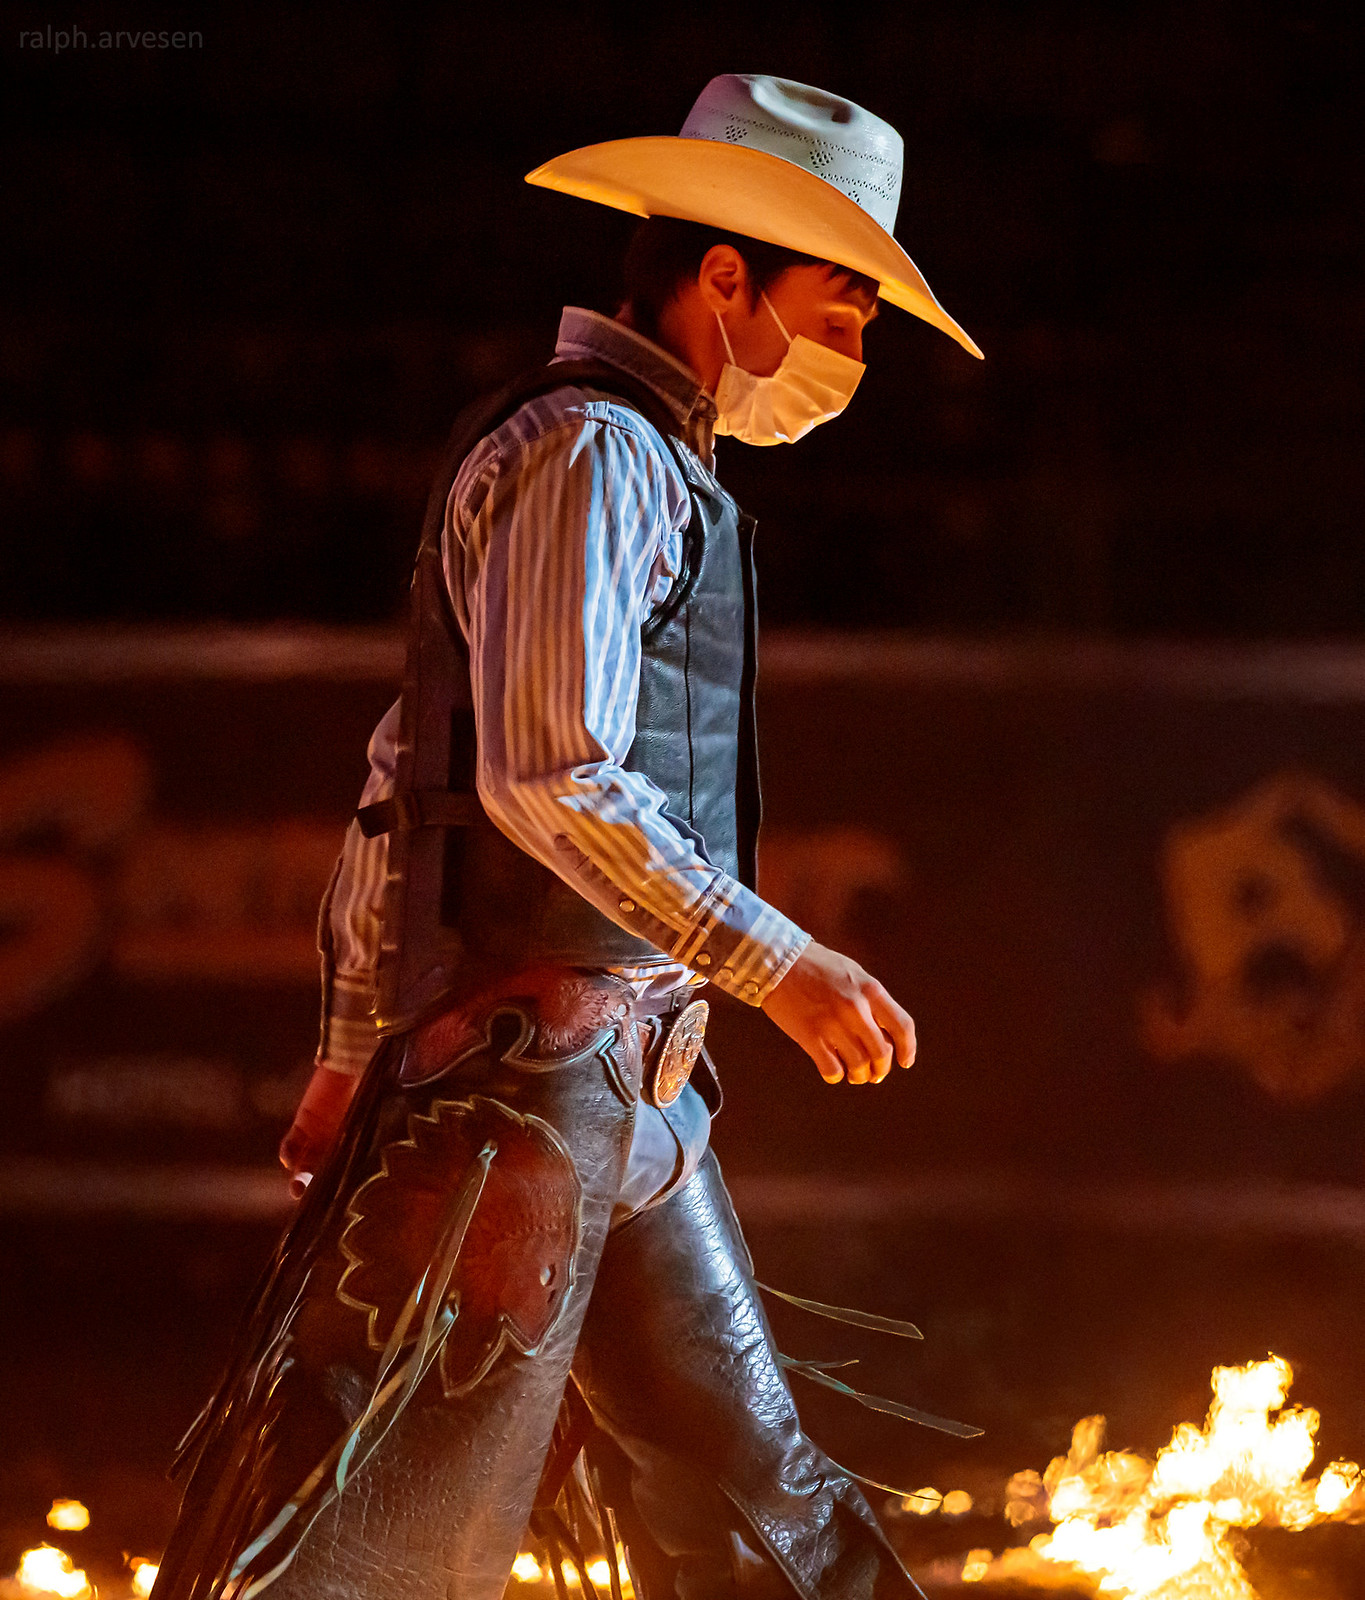 Professional Bull Riders | Texas Review | Ralph Arvesen